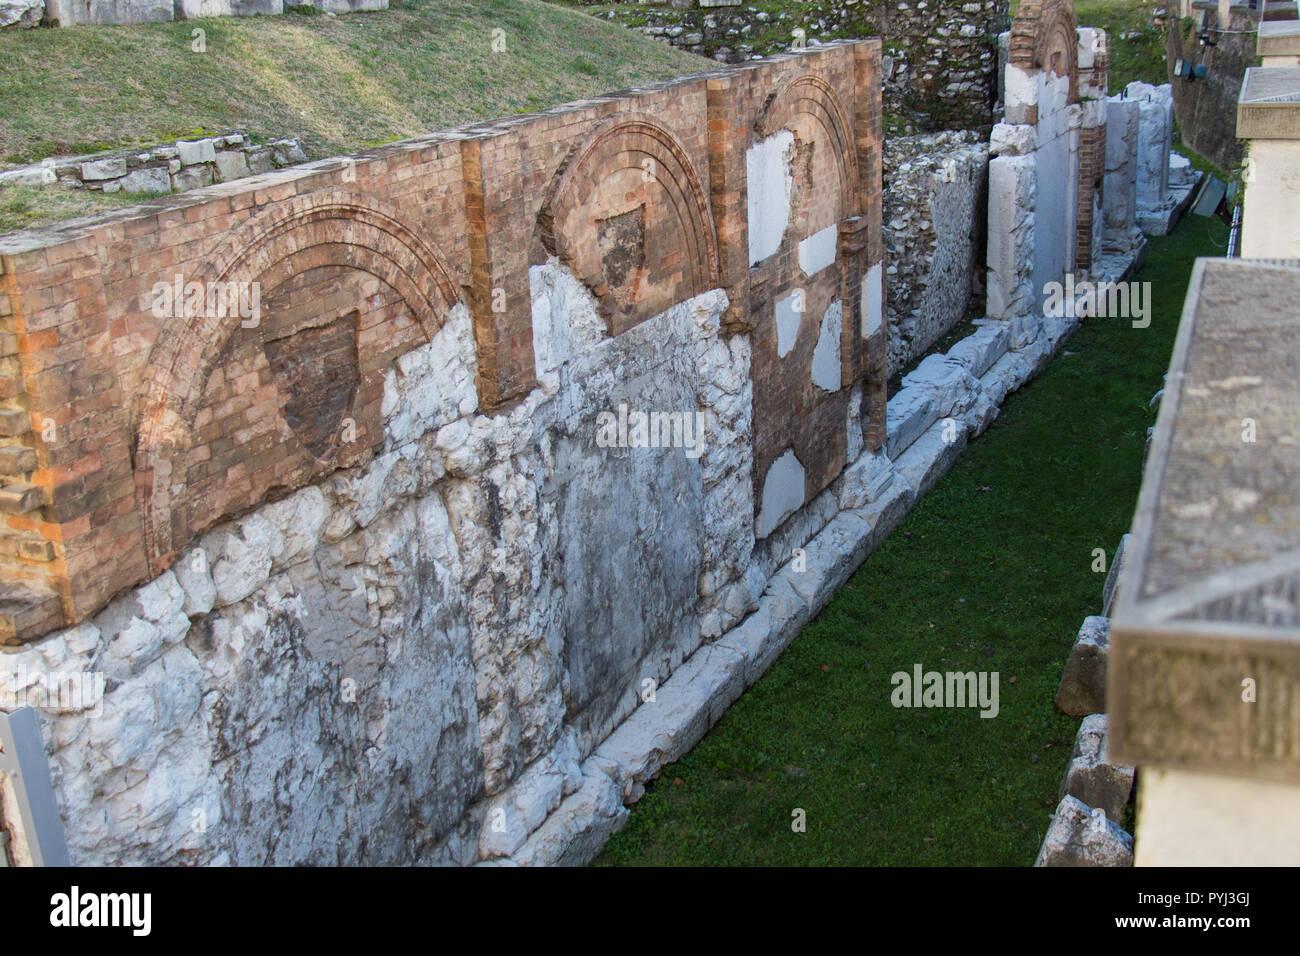 Italy, Brescia - December 24 2017: the view ruins of Foro Romano of Capitolium, Ancient Roman temple, UNESCO World Heritage Site on December 24 2017. - Stock Image